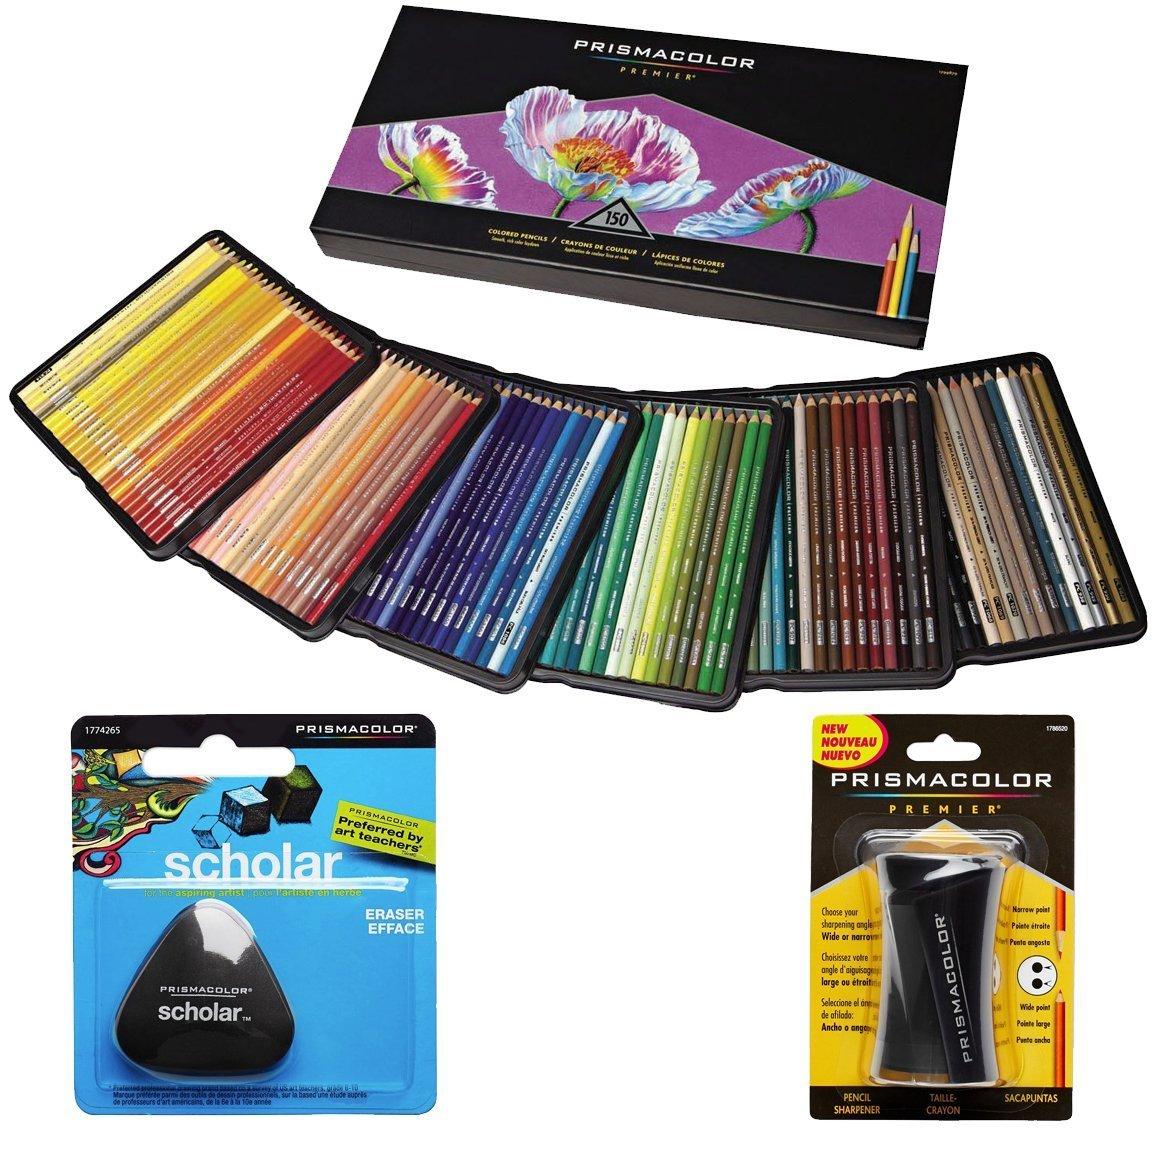 Prismacolor Colored Pencils Box of 150 Assorted Colors, Triangular Scholar Pencil Eraser and Premier Sharpener (1800059+VE99016+1774265) by PRISMACOLOR